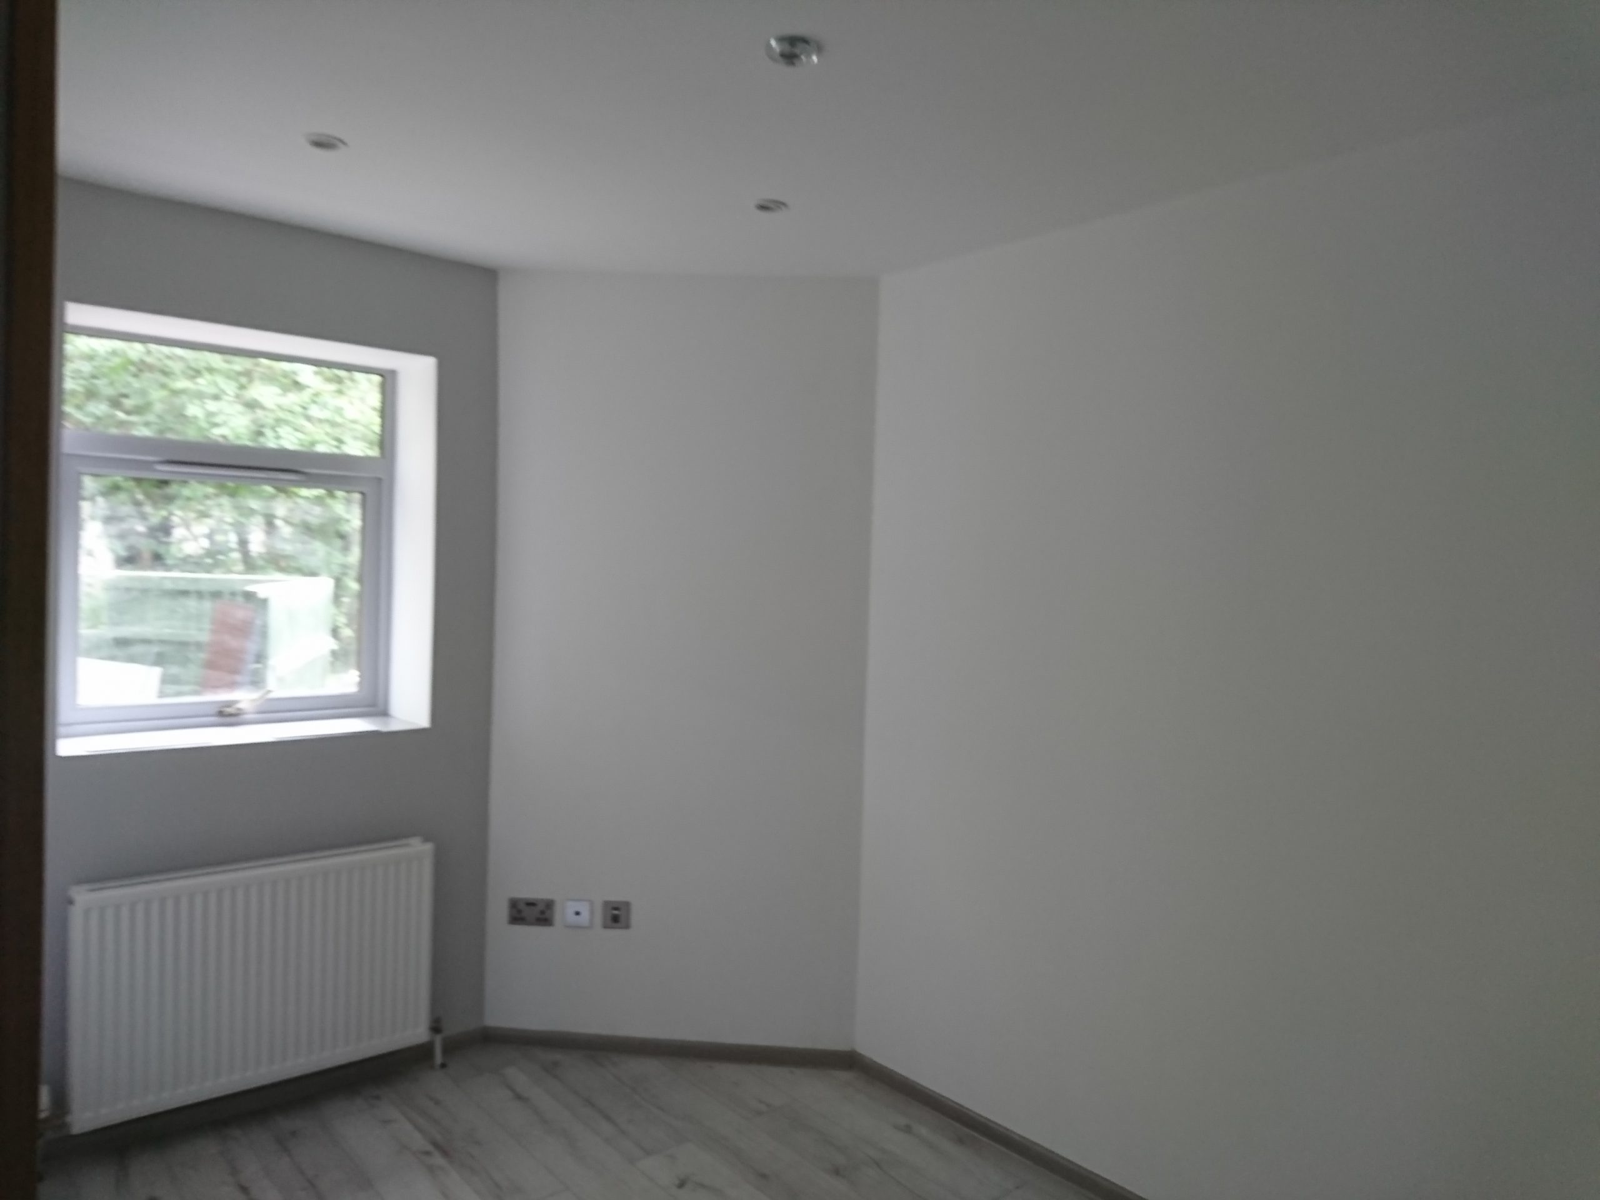 solid-wall-insulation-edinburgh-insulation-installation-edinburgh